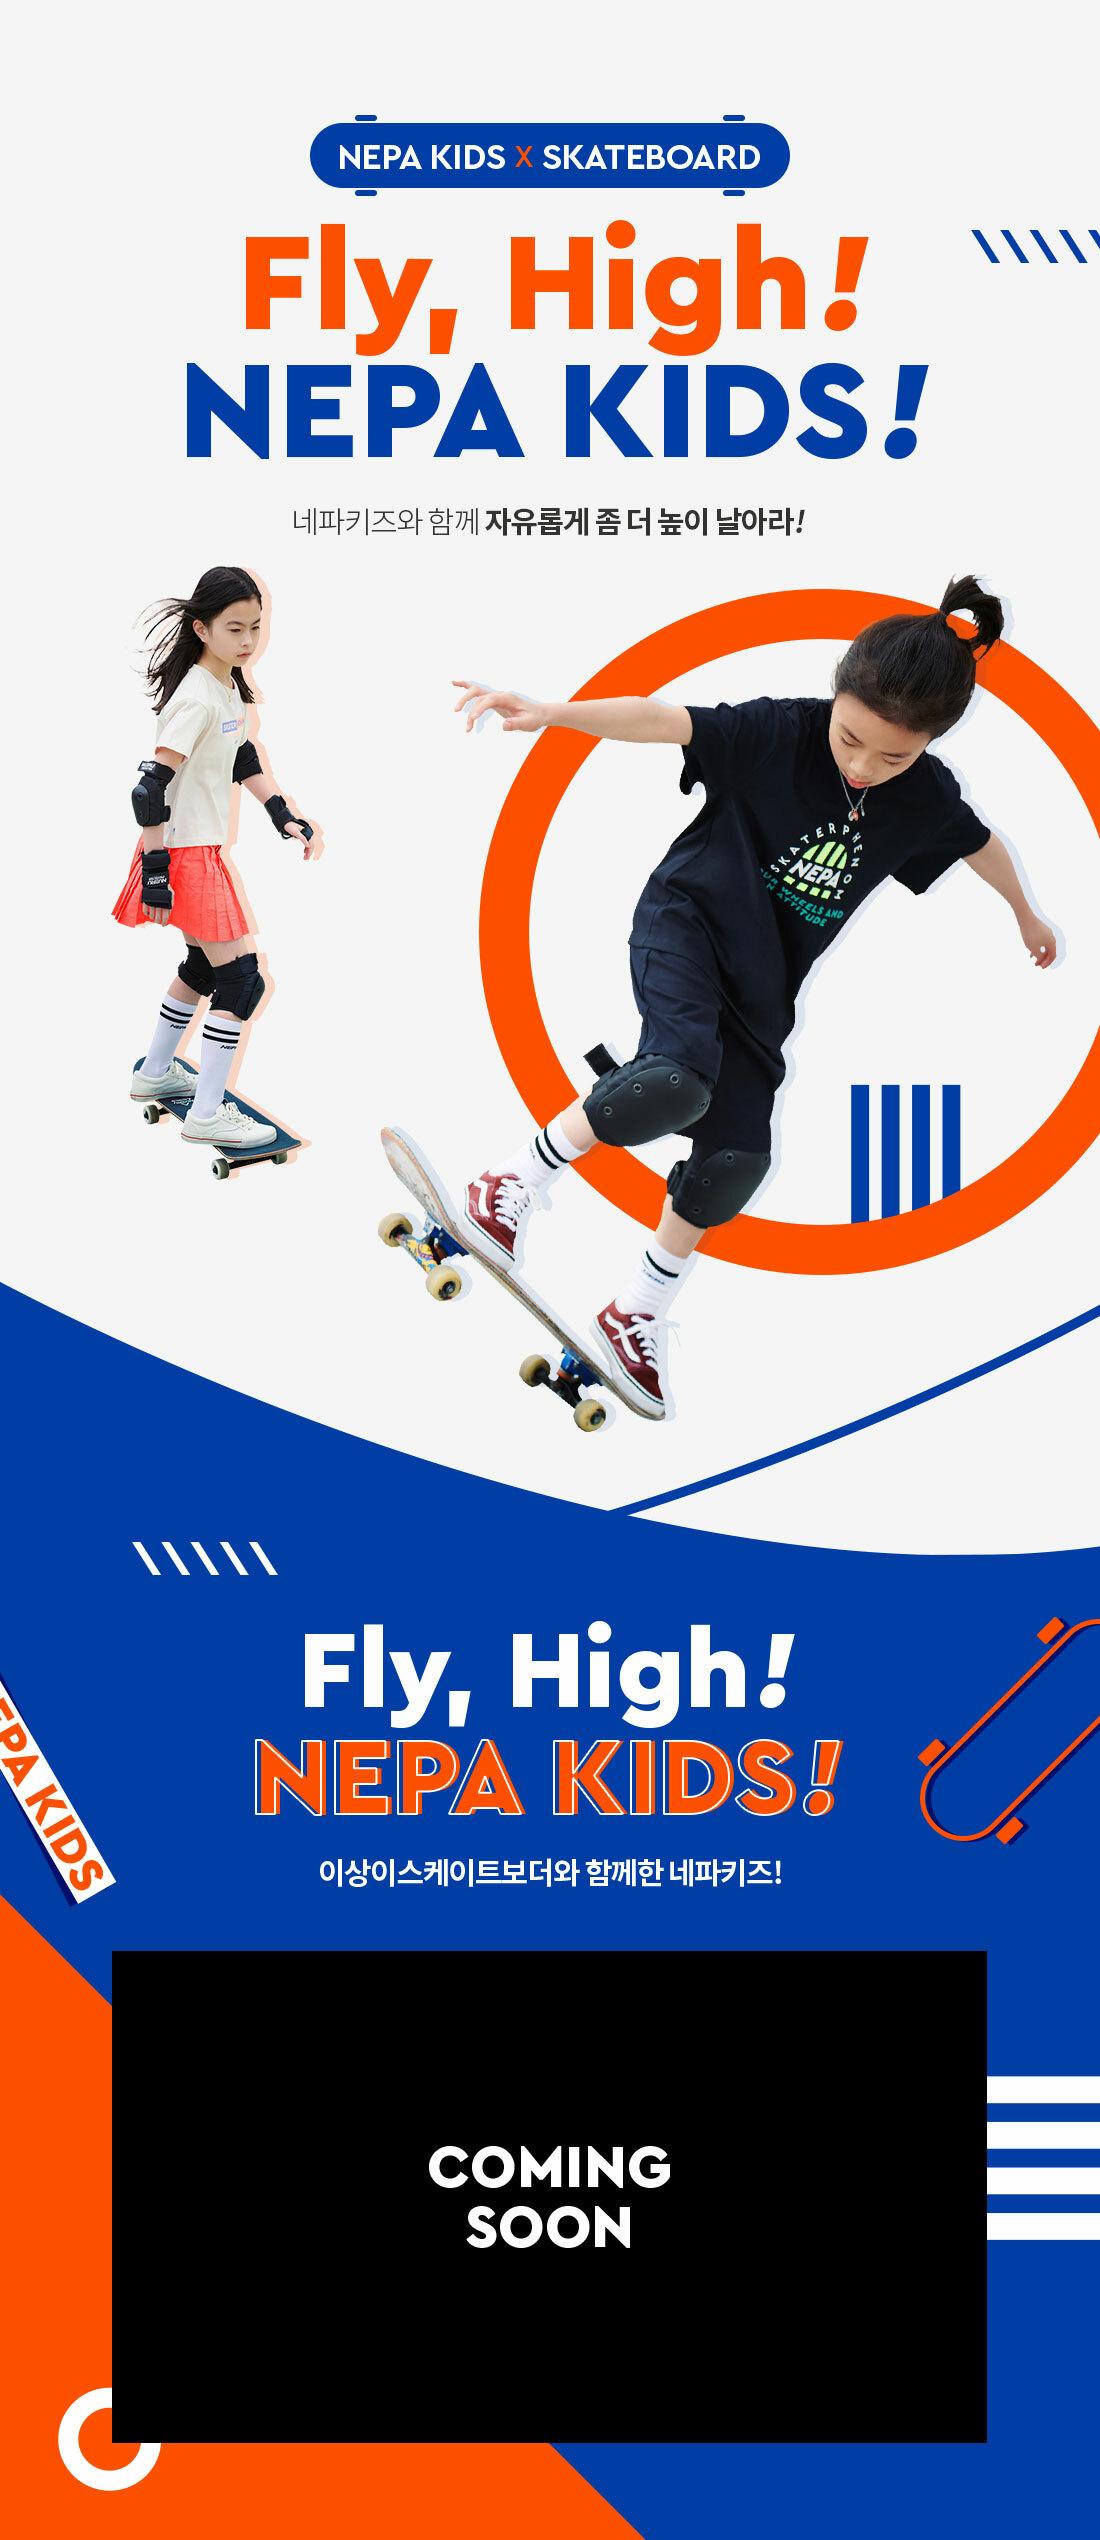 NEPA KIDS X SKATEBOARD fly, high! nepa kids! 네파키즈와 함께 자유롭게 좀 더 높이 날아라!